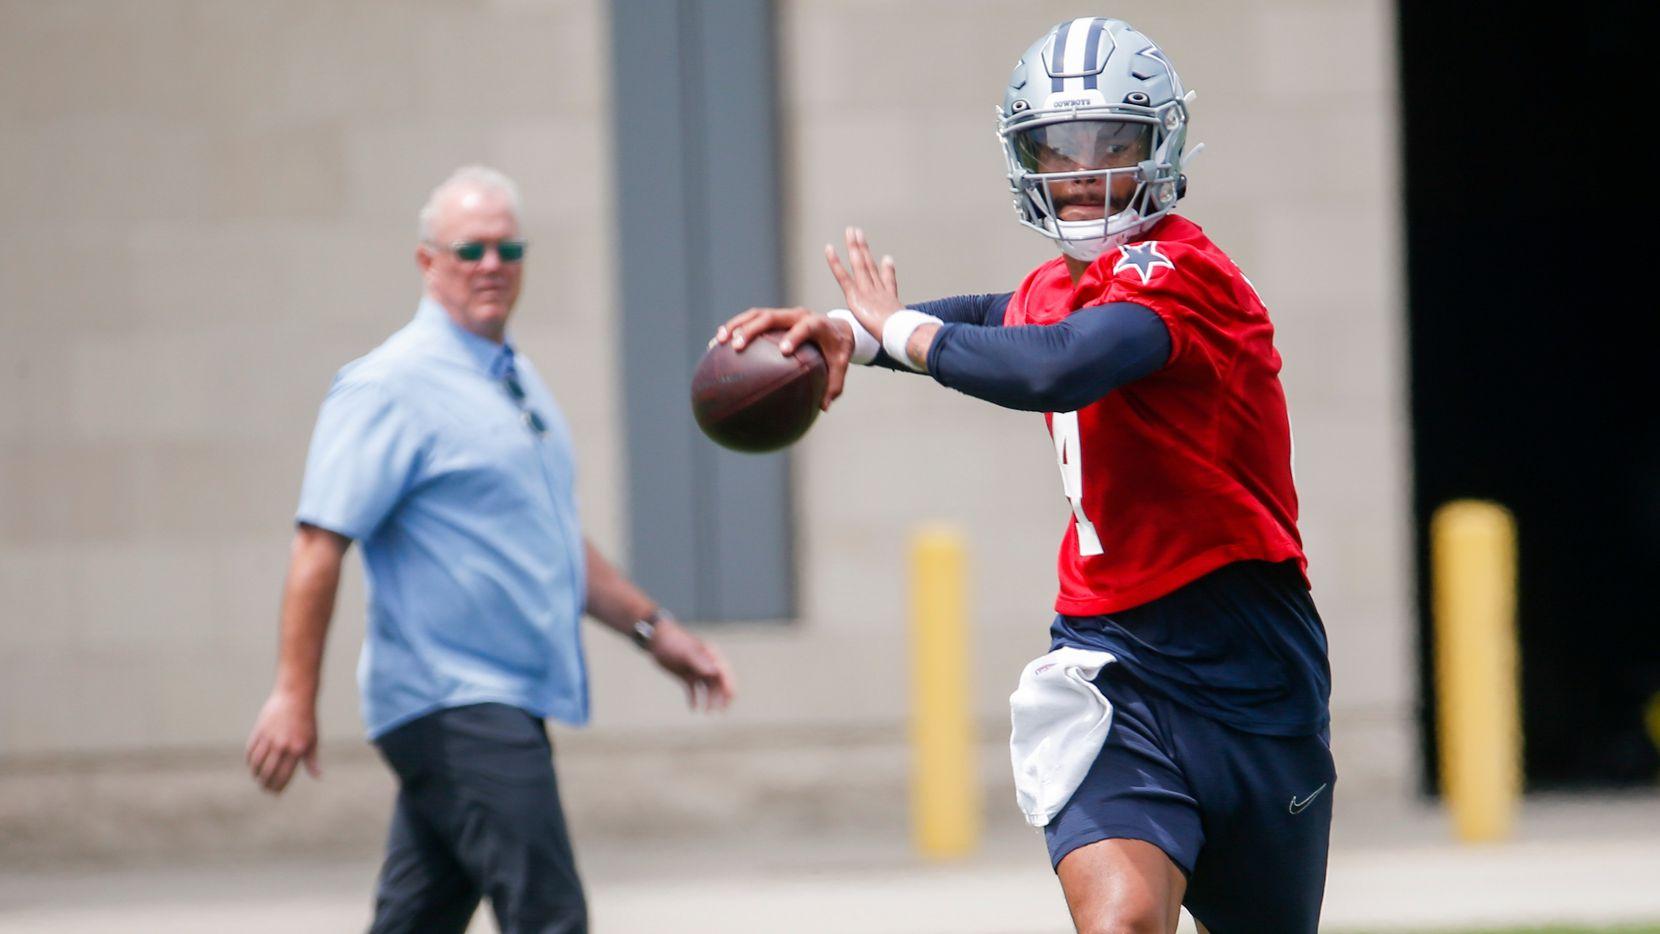 Dallas Cowboys CEO Stephen Jones watches as Dallas Cowboys quarterback Dak Prescott (4) practices during the Cowboys second OTA practice on Thursday, June 3, 2021, at the Star in Frisco. (Juan Figueroa/The Dallas Morning News)